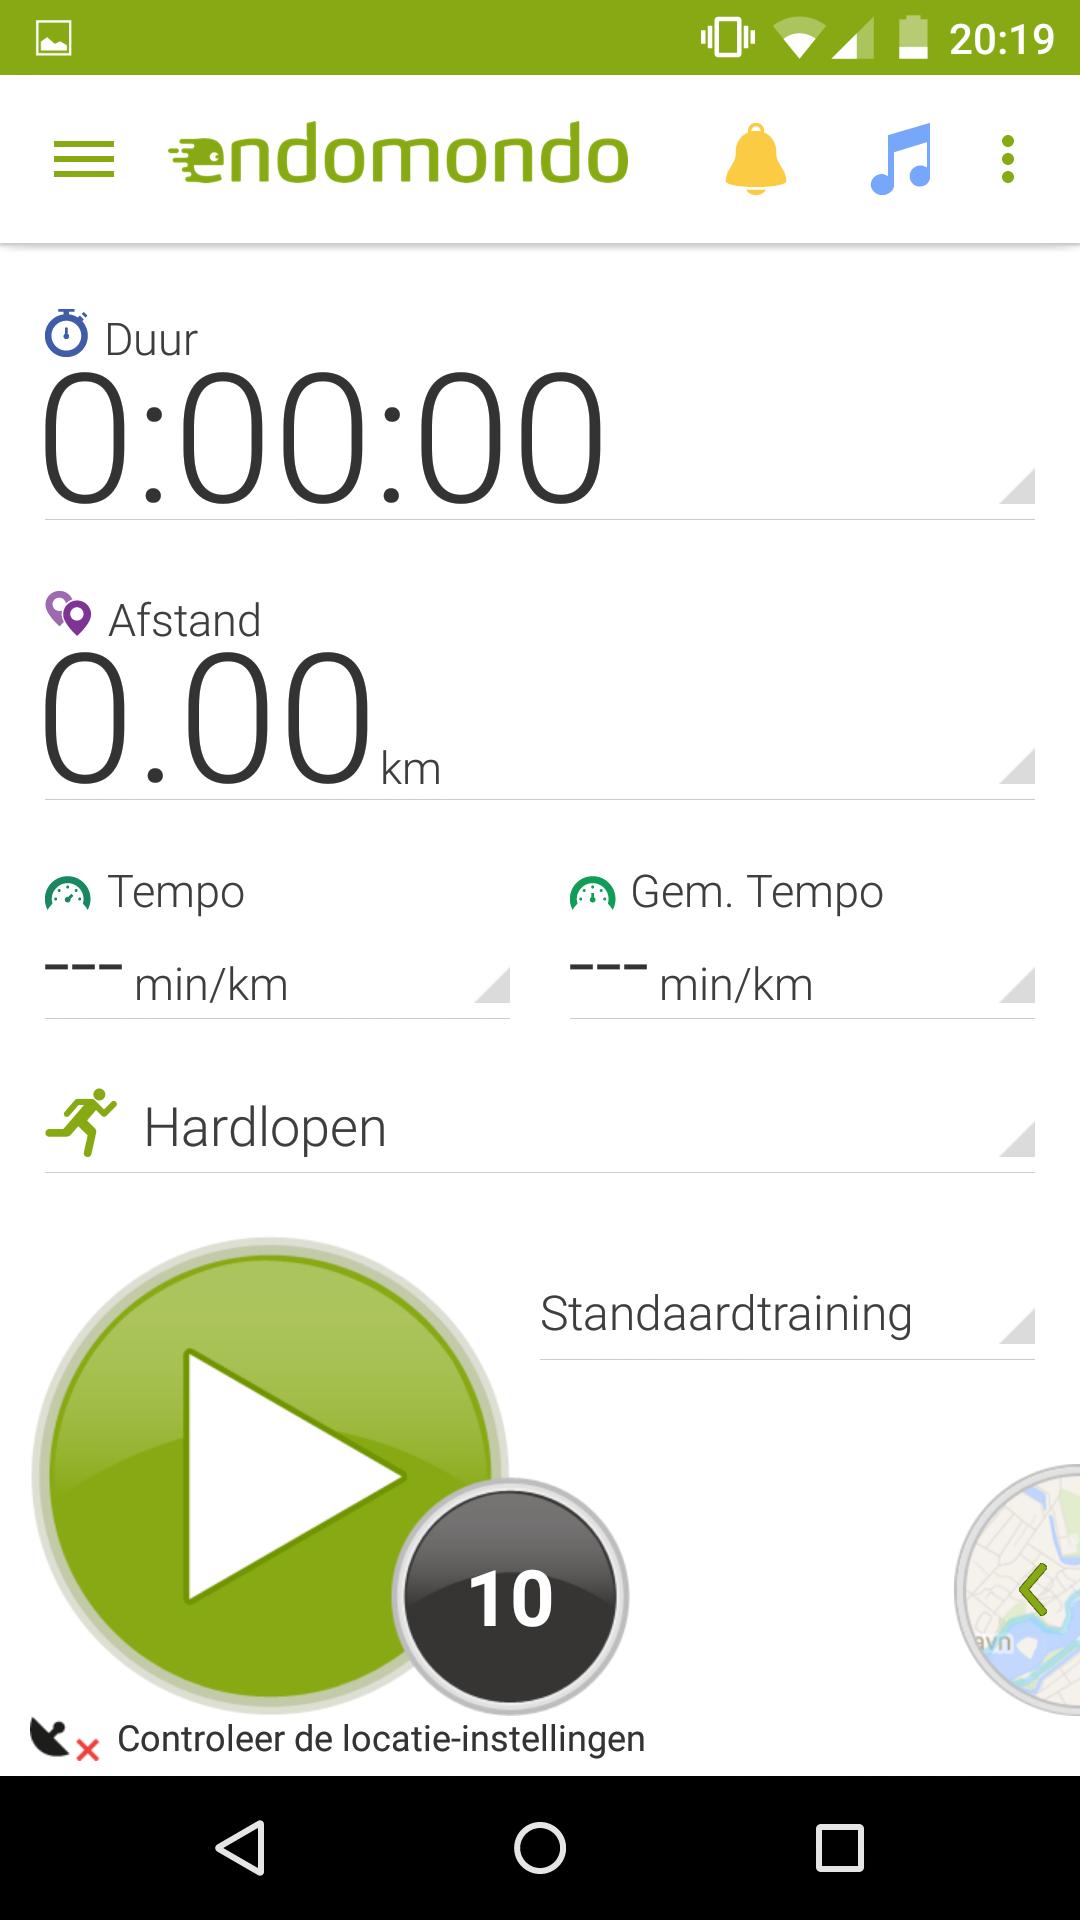 Endomondo app main screen